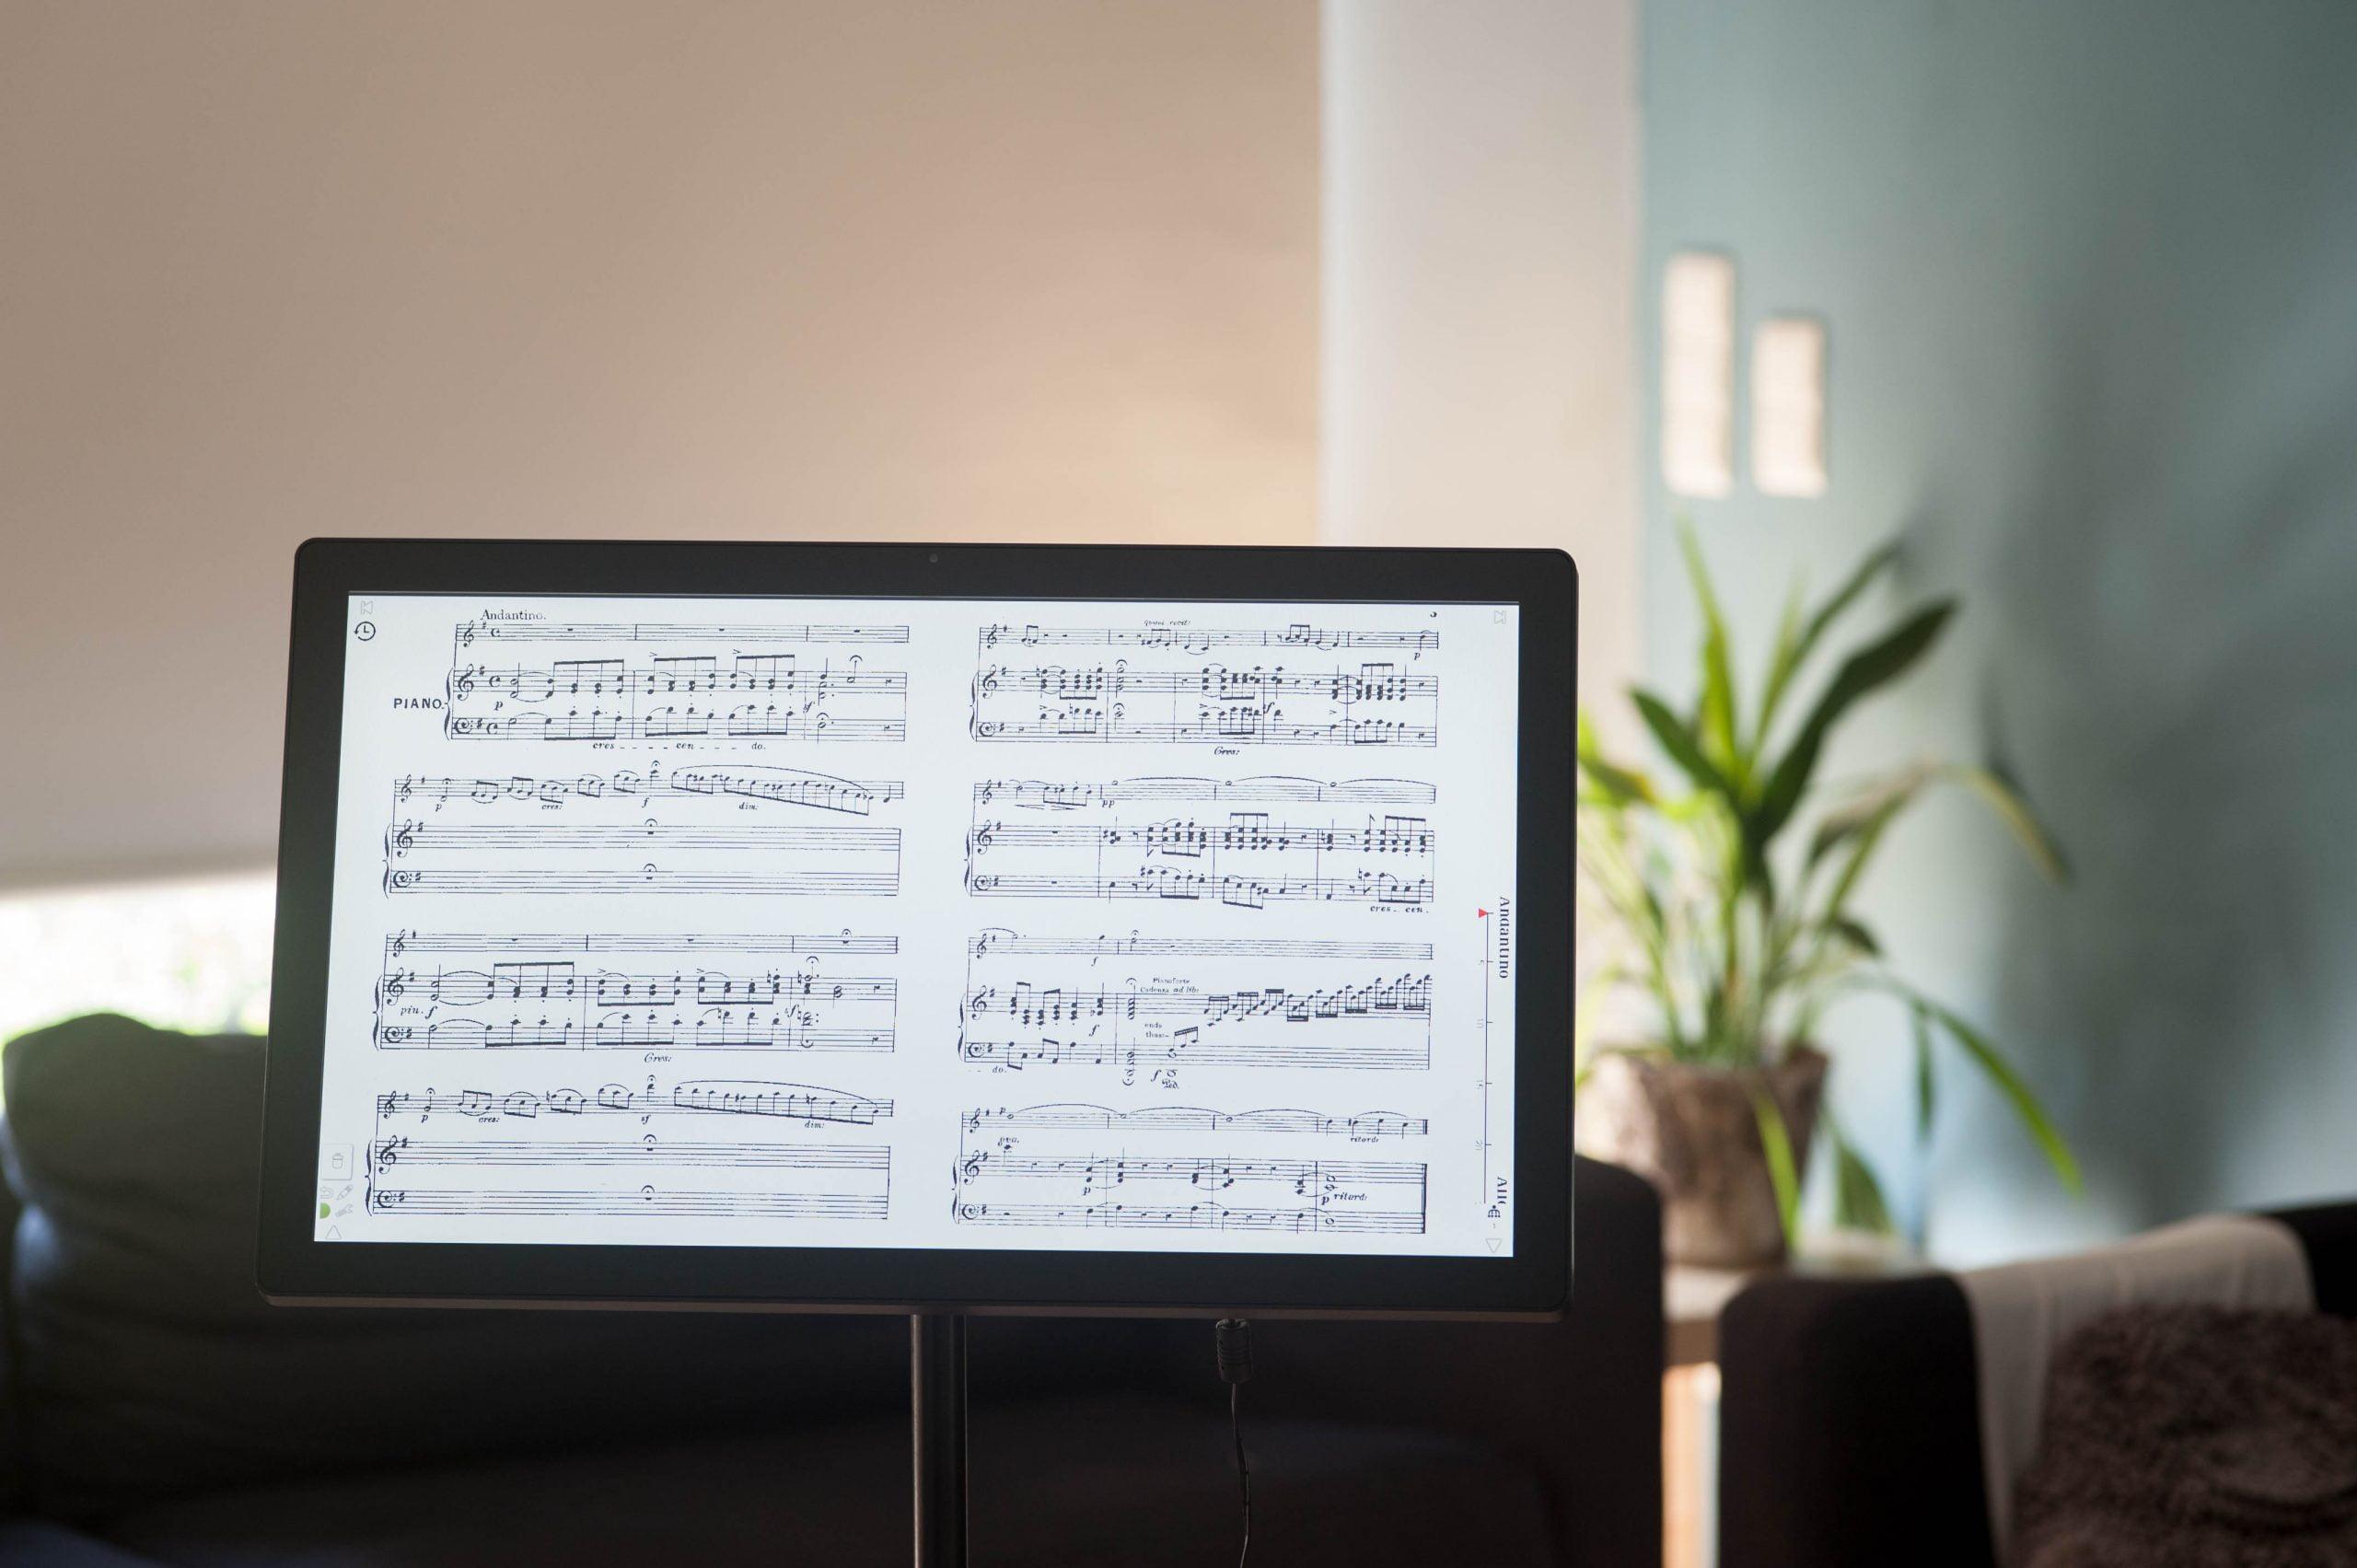 Maestro Scora tablet